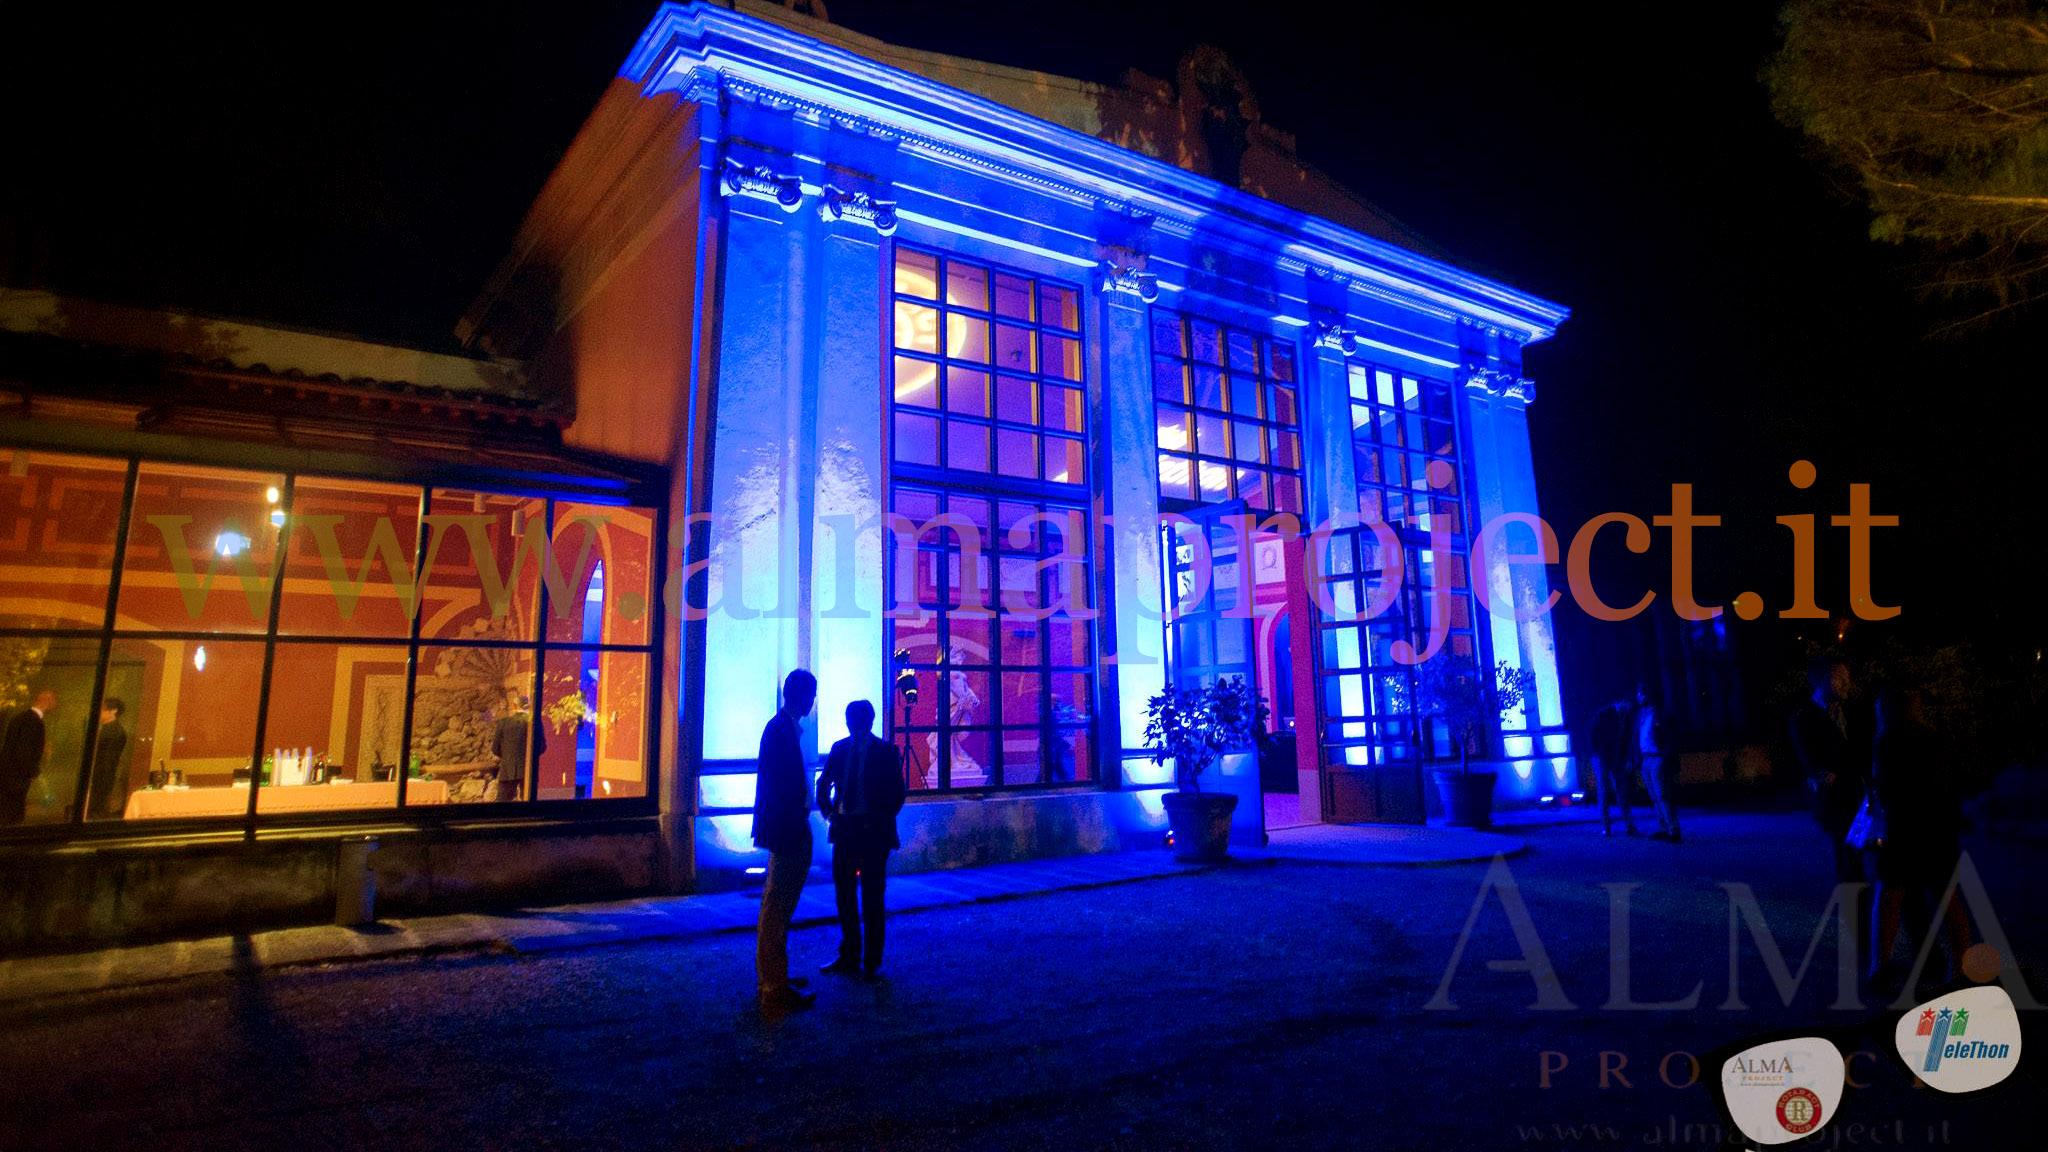 ALMA PROJECT 24/7 @ Museo Stibbert